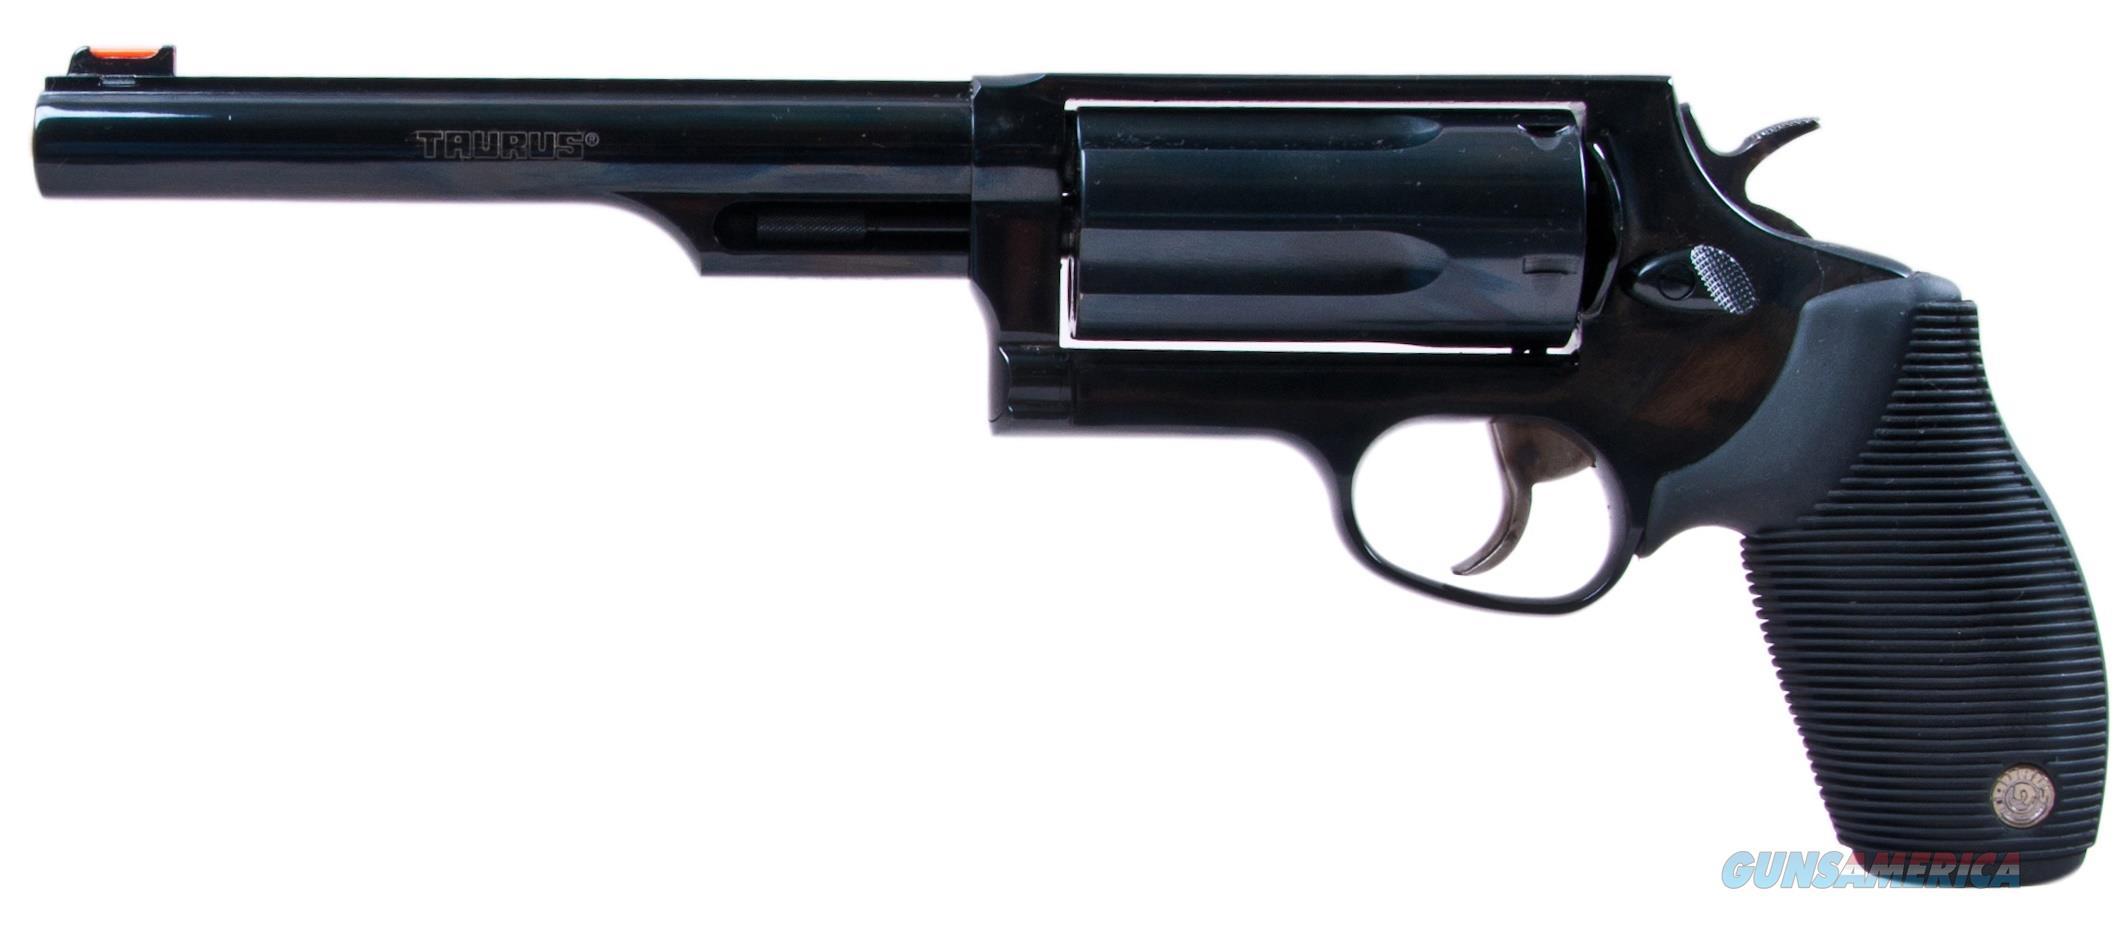 "Taurus Judge Tracker Magnum 410/45 LC 6.5"" 5 Shot - New in Box  Guns > Pistols > Taurus Pistols > Revolvers"